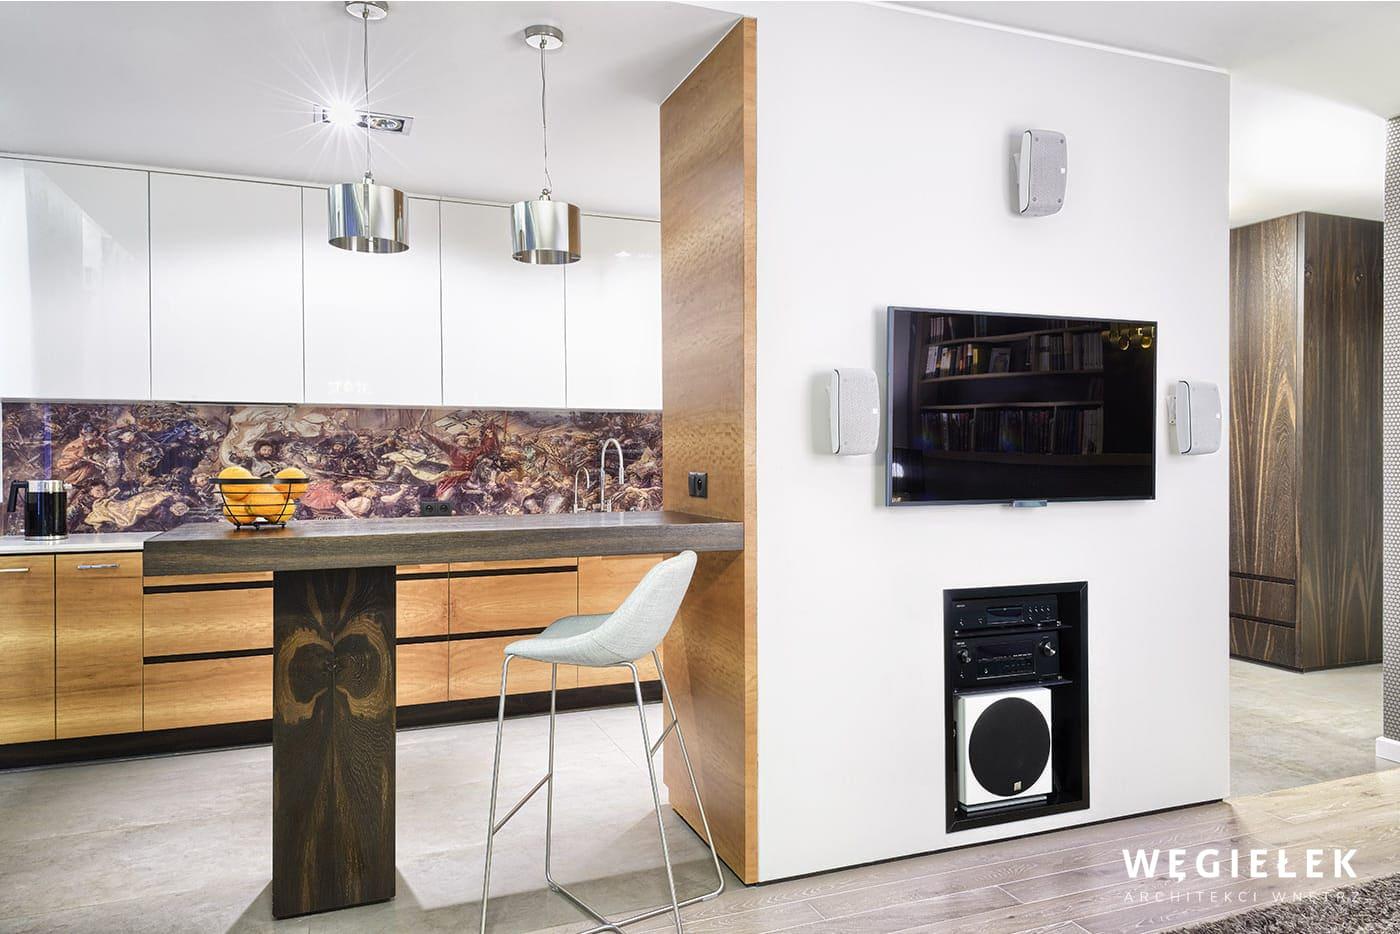 03 salon kuchnia barek drewniany